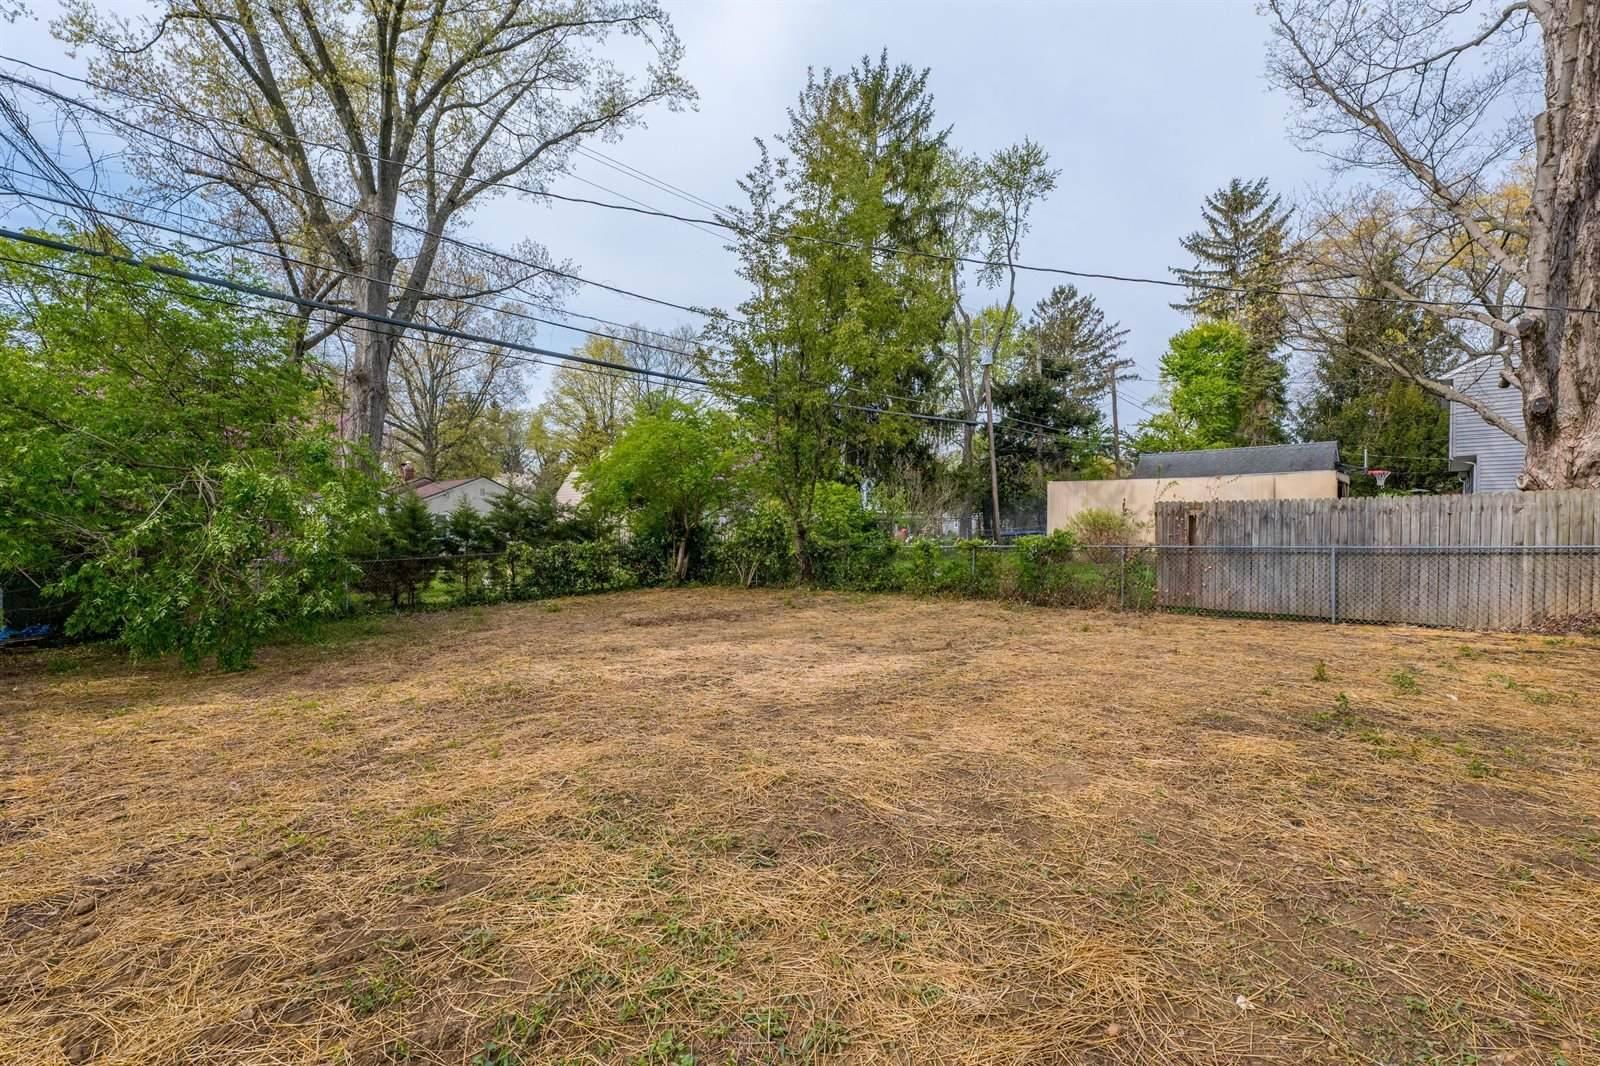 111 Orchard Drive, Worthington, OH 43085